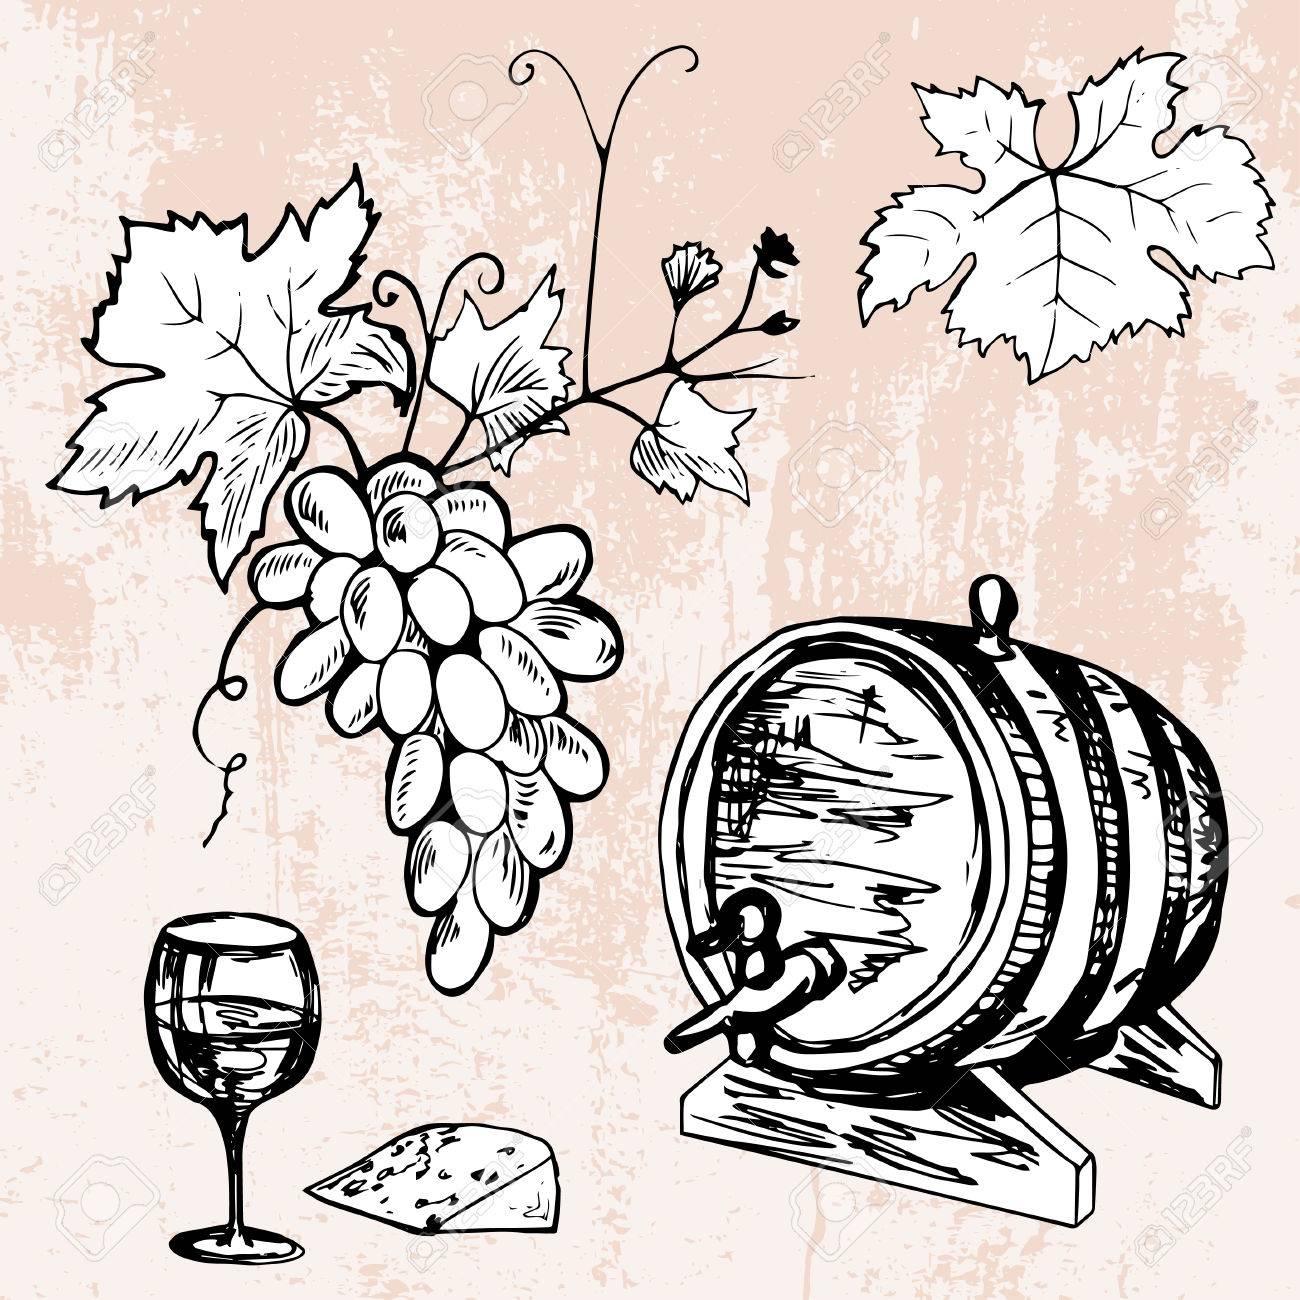 shand drawn set of barrel of wine grape wineglass and cheese Grape VATS Fibergalss shand drawn set of barrel of wine grape wineglass and cheese stock vector